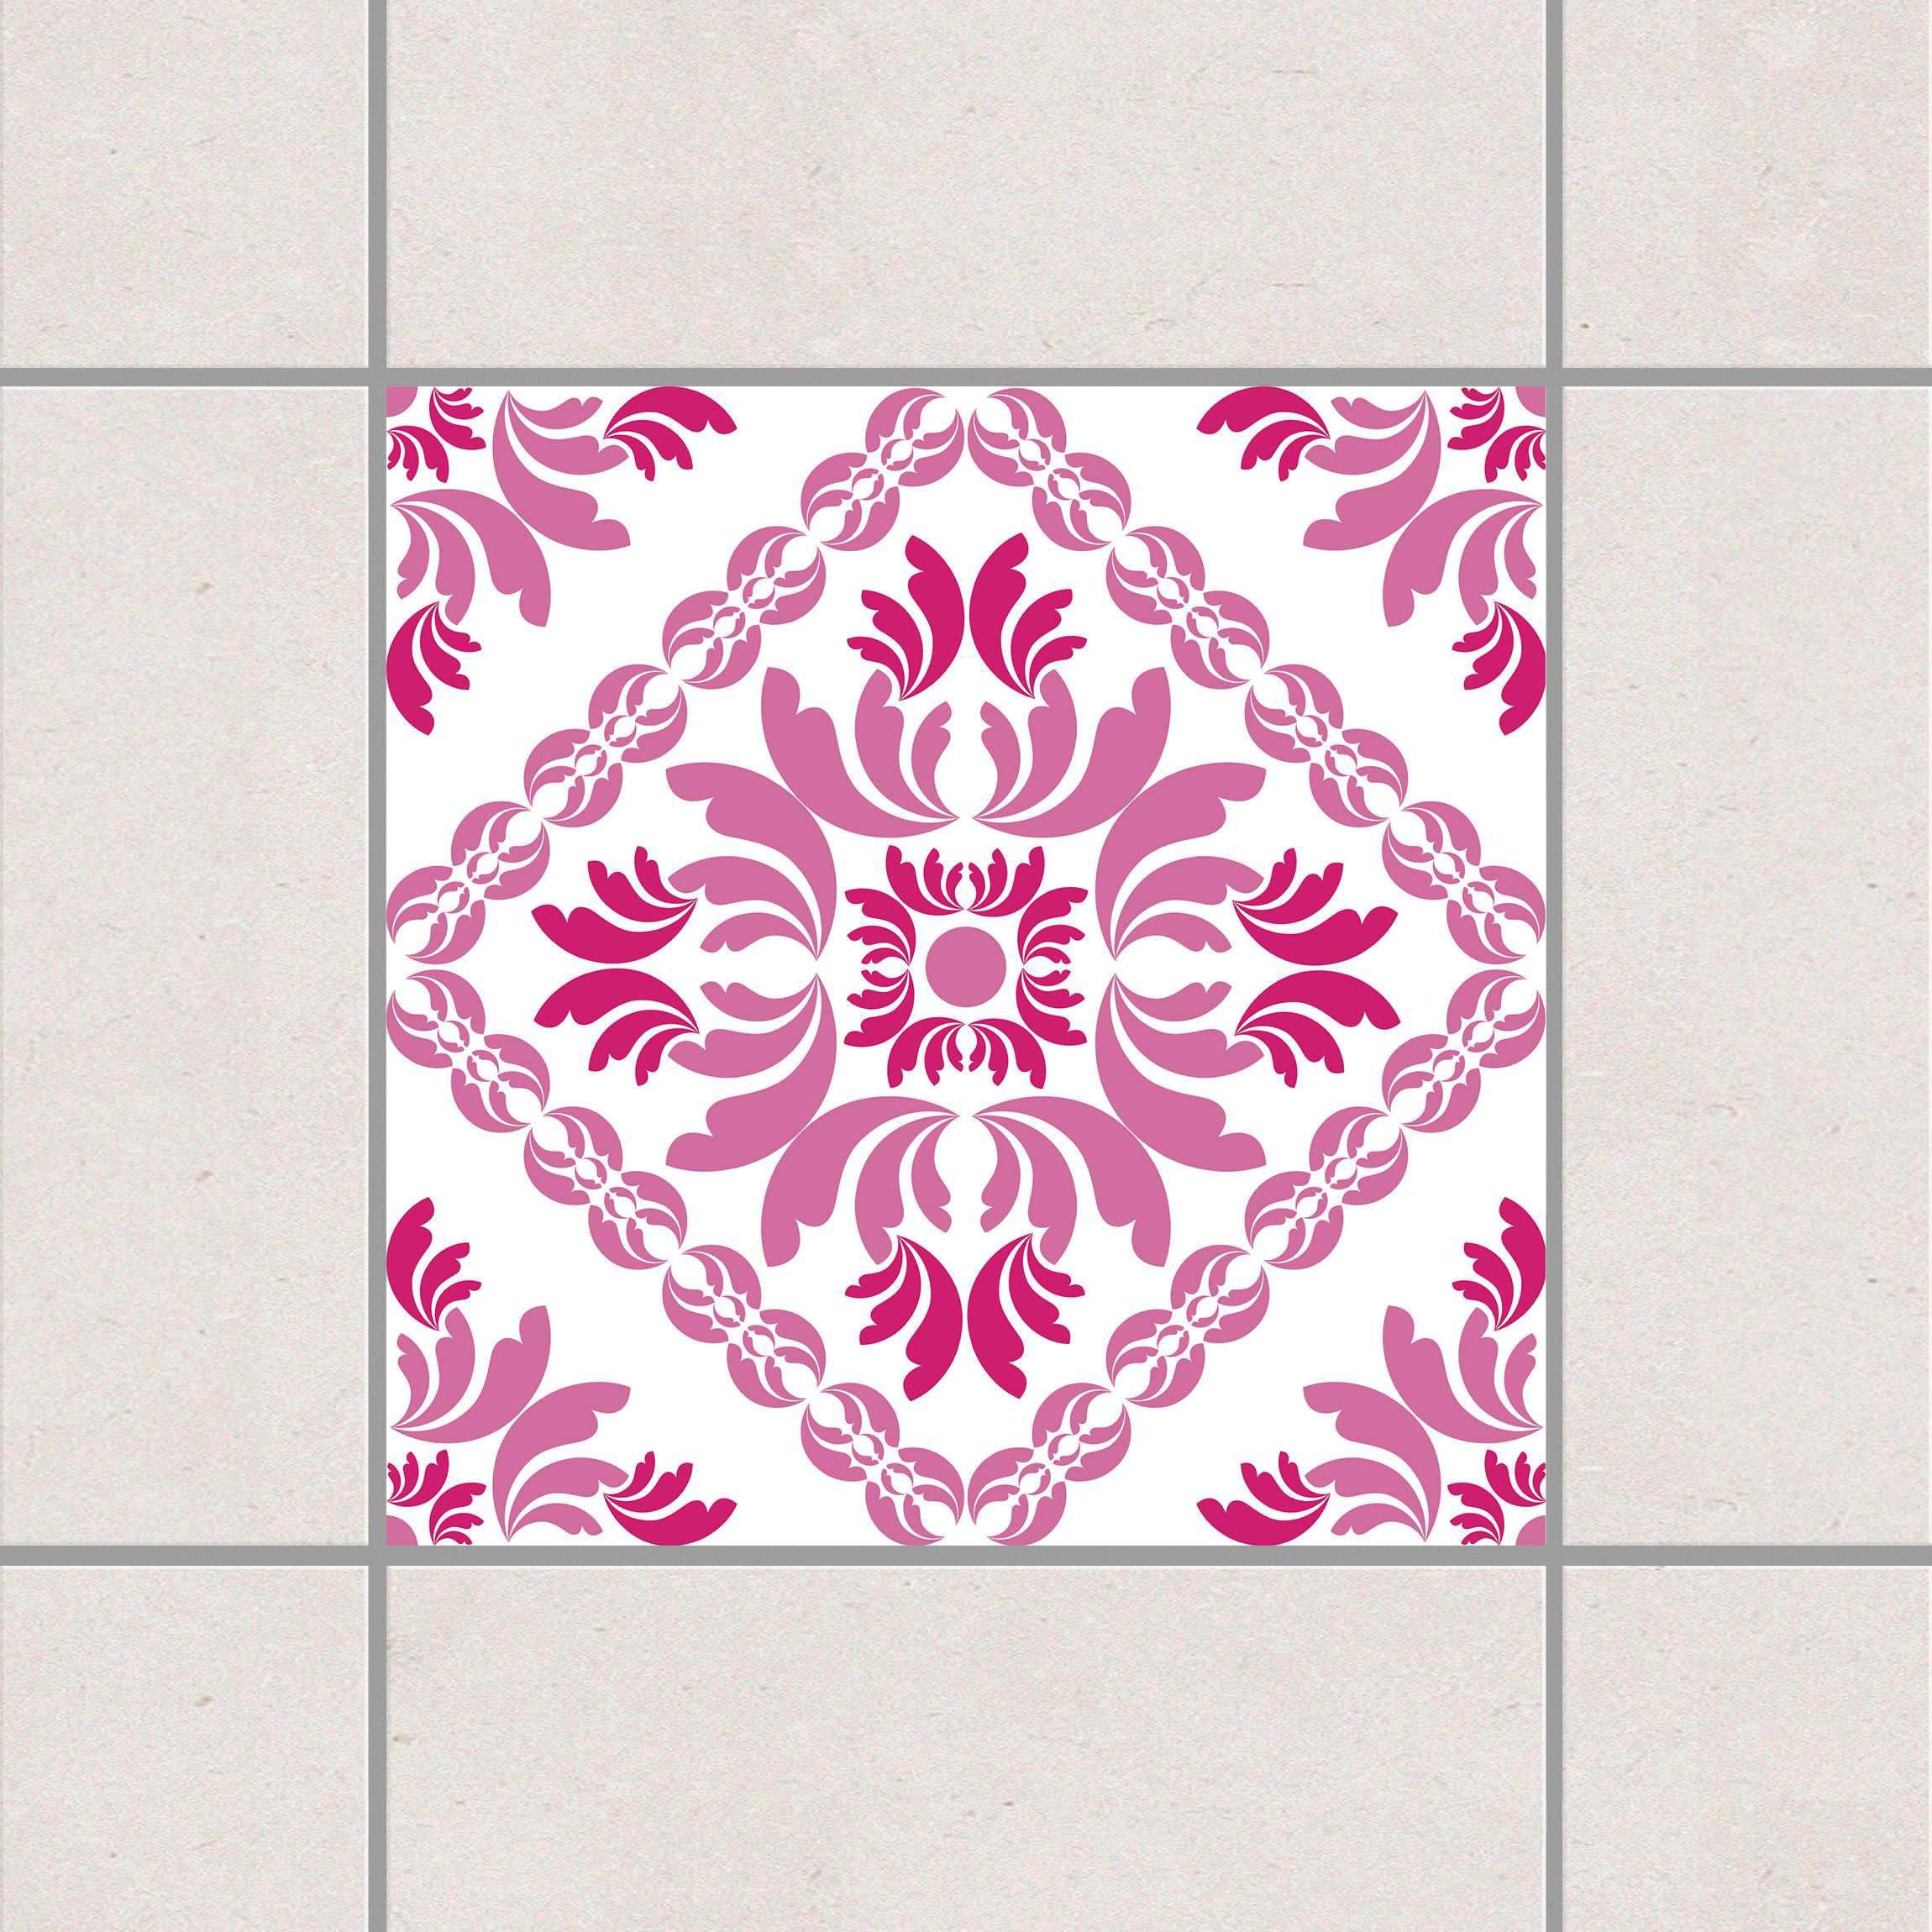 Fliesenaufkleber vera rosa 15x15 cm fliesensticker set for Fliesensticker 15x15